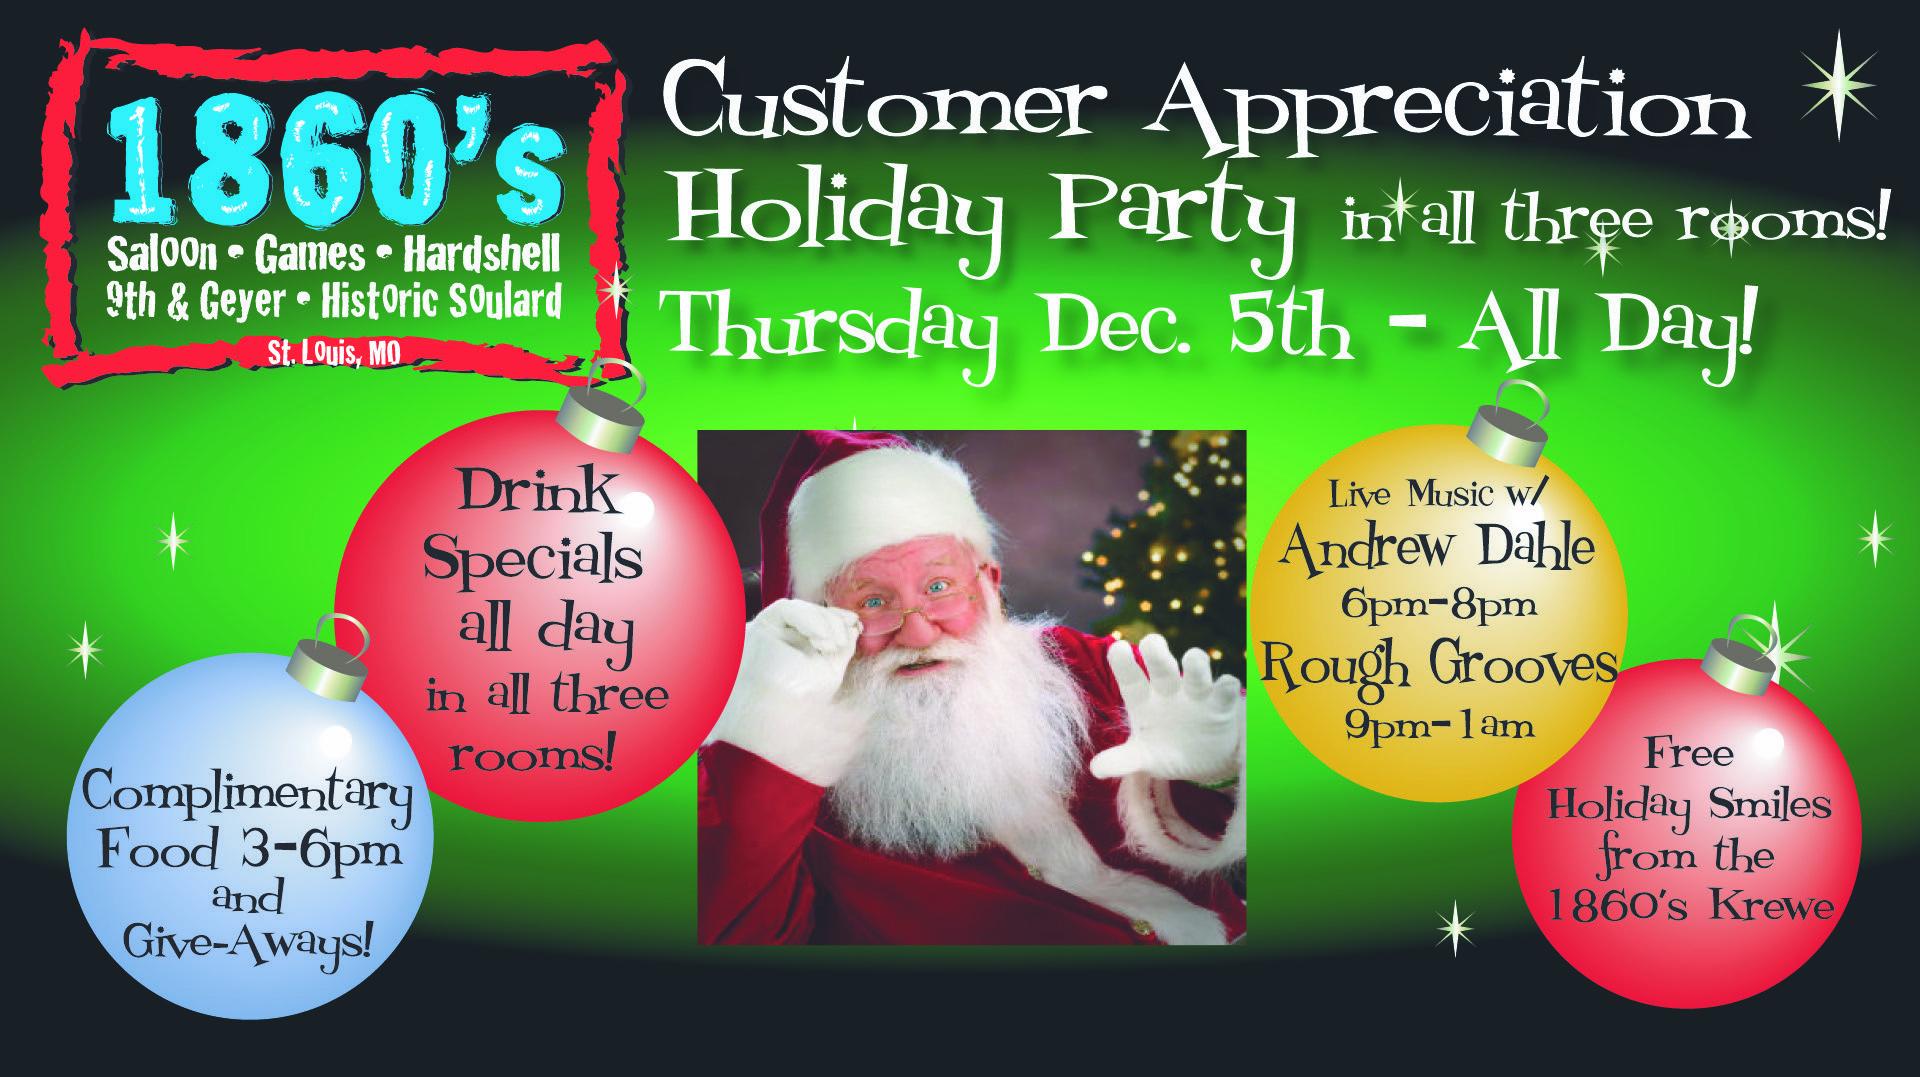 Thursday Dec. 5 Customer appreciation party all day!